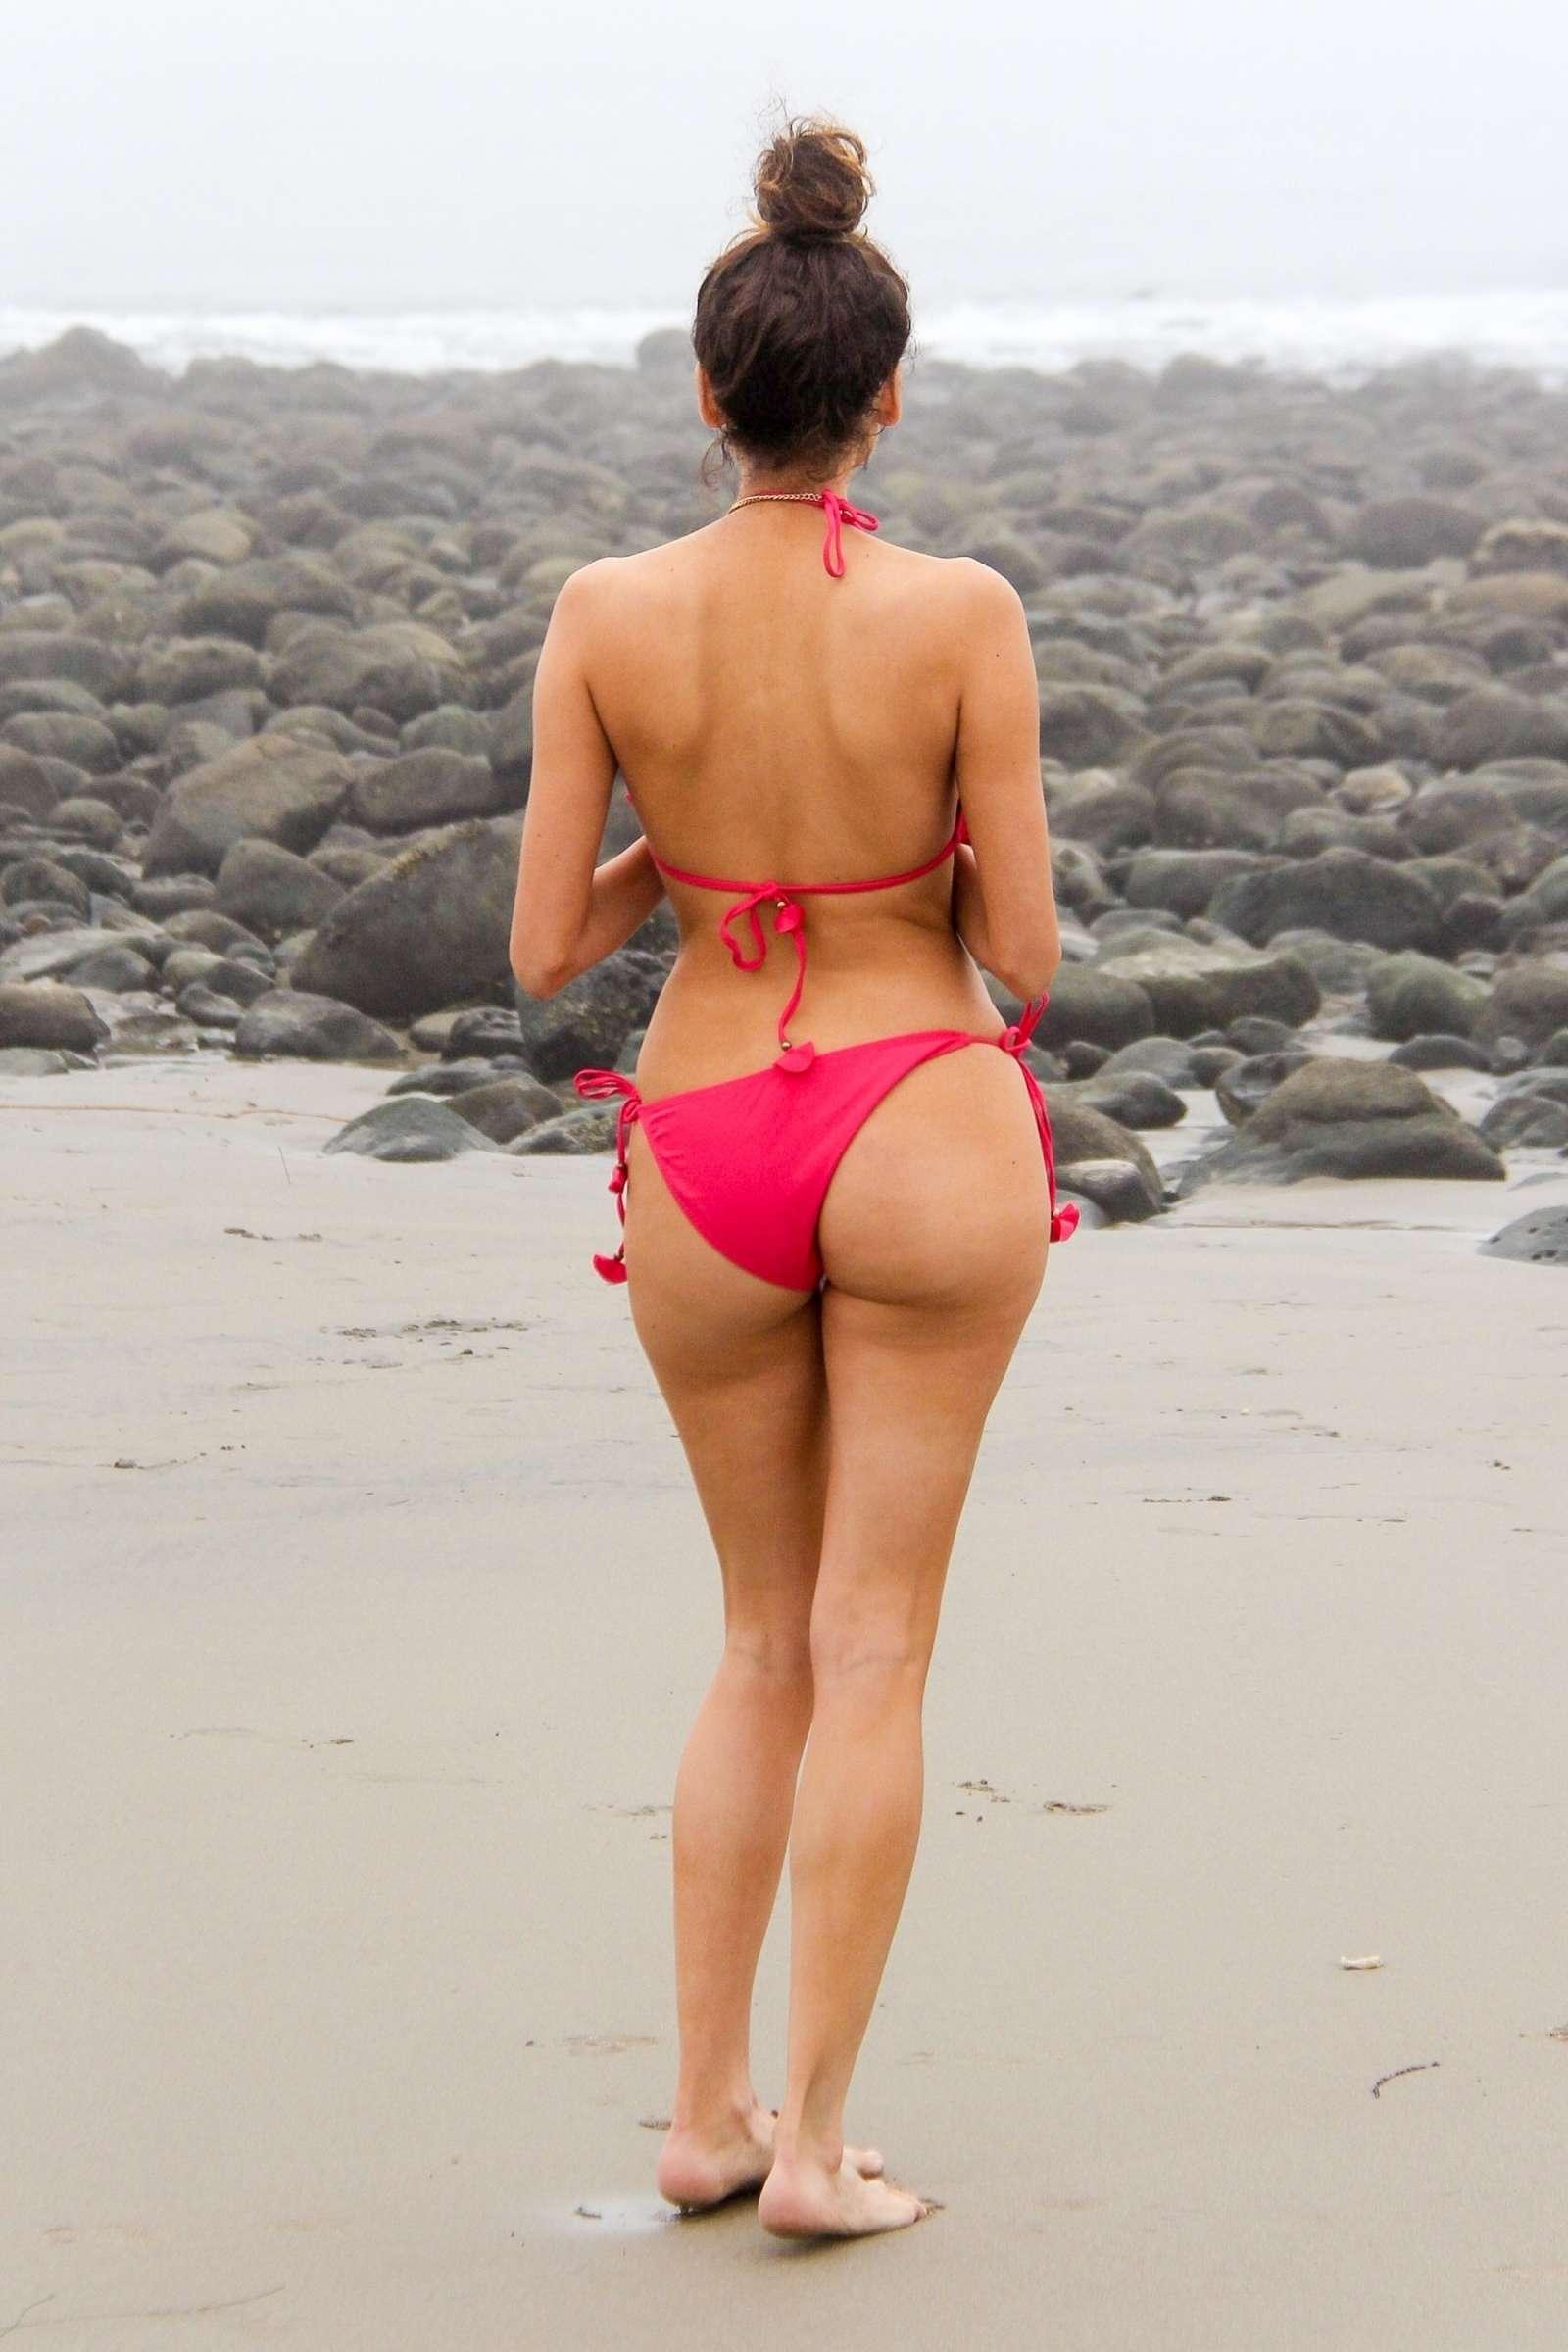 Blanca Blanco 2018 : Blanca Blanco in Red Swimsuit 2018 -06